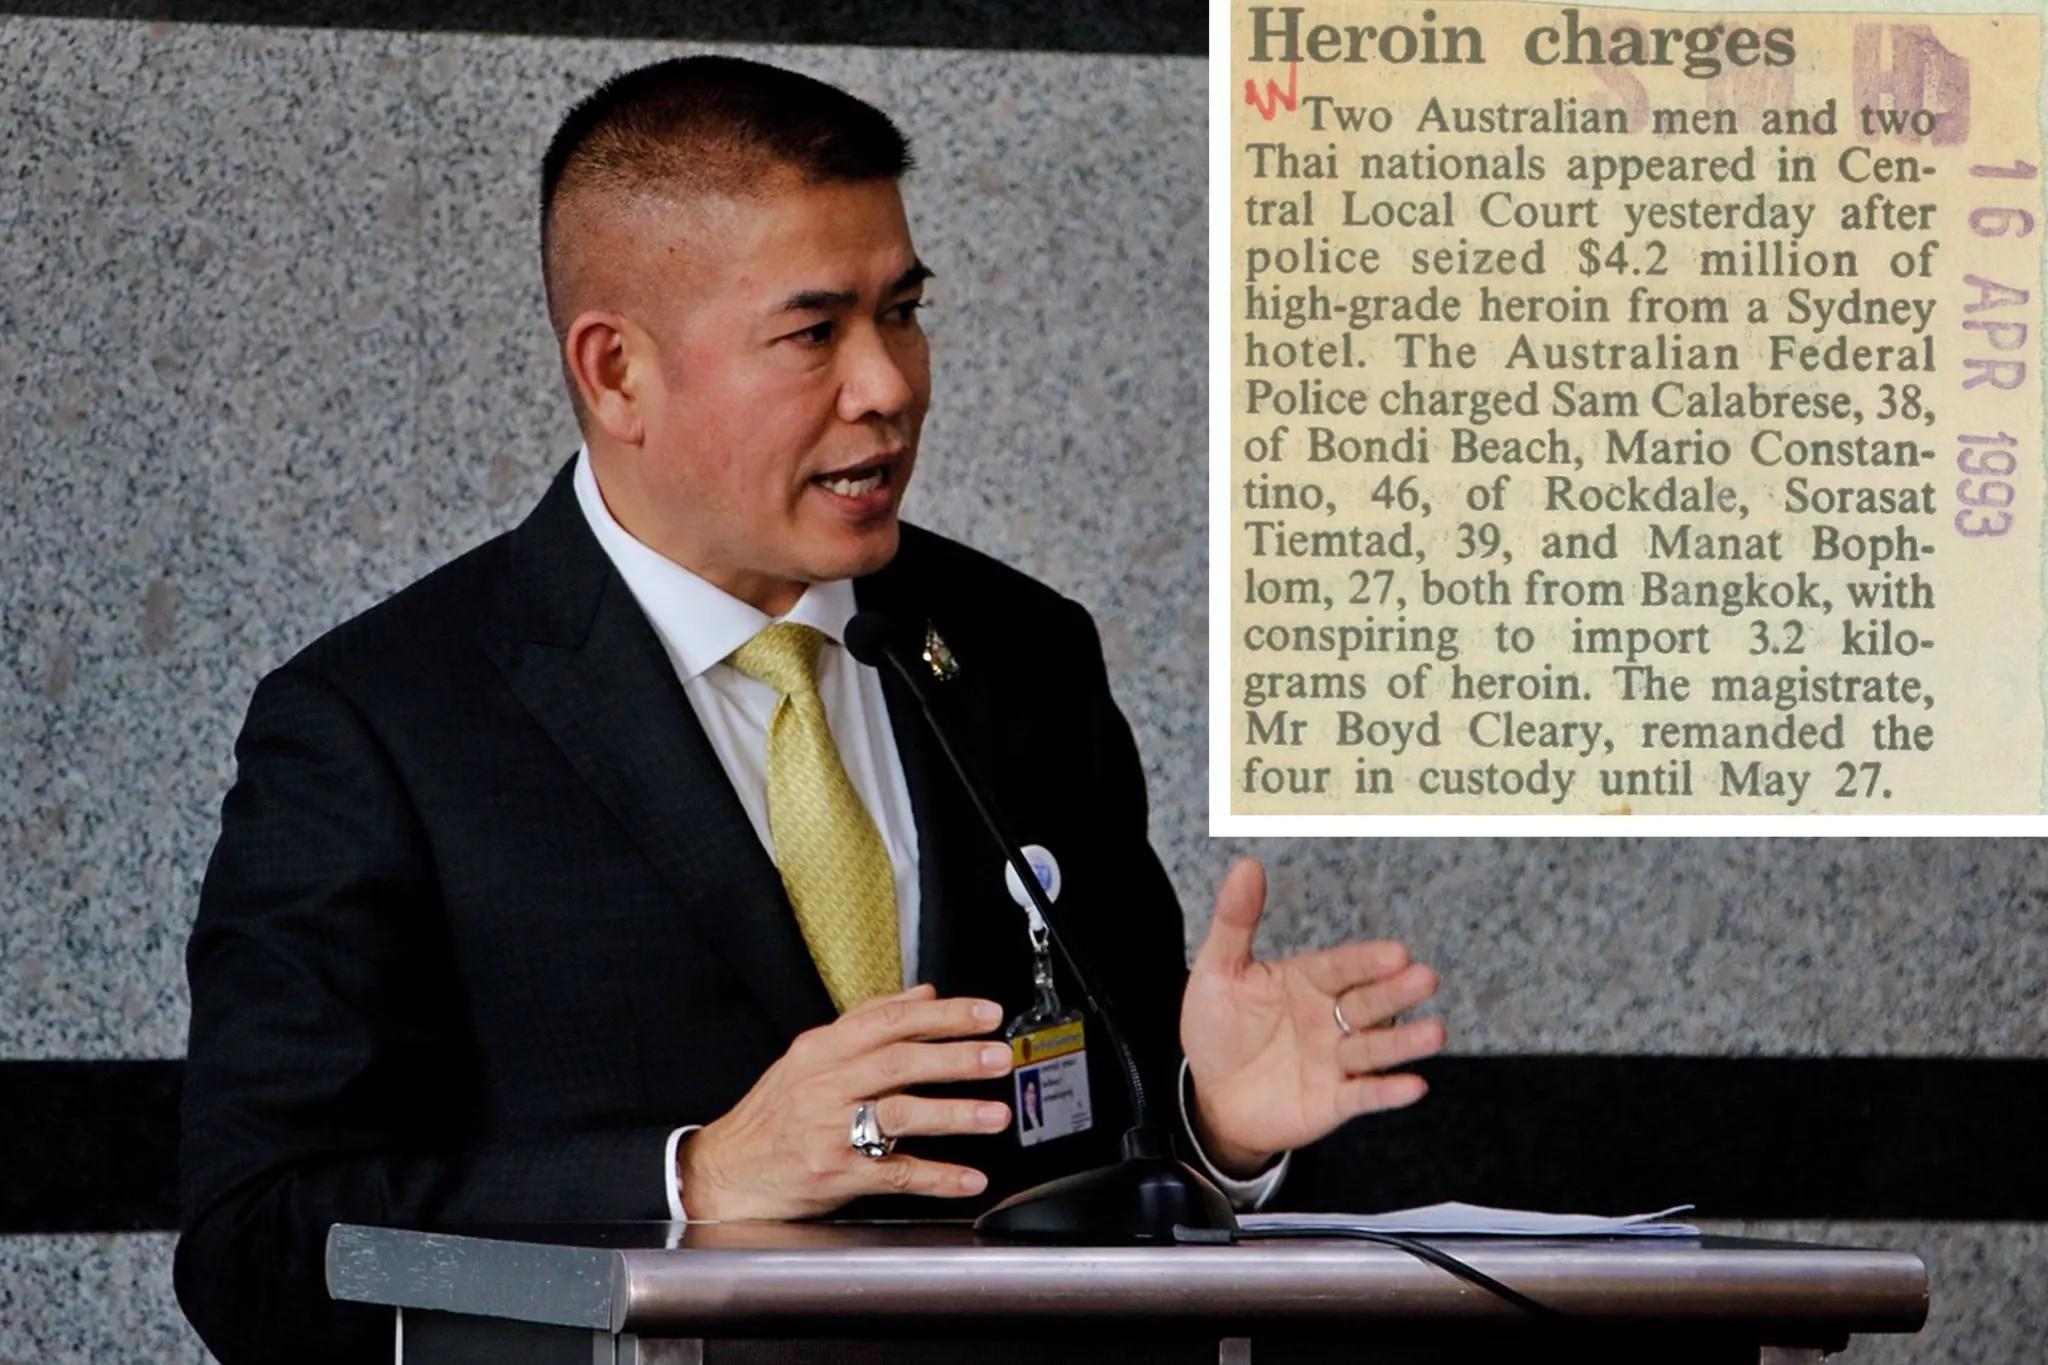 Thai court rules minister can keep job despite alleged heroin trafficking link-67d53c5bfeba842b6116daf425c9a7d39402b476-jpg